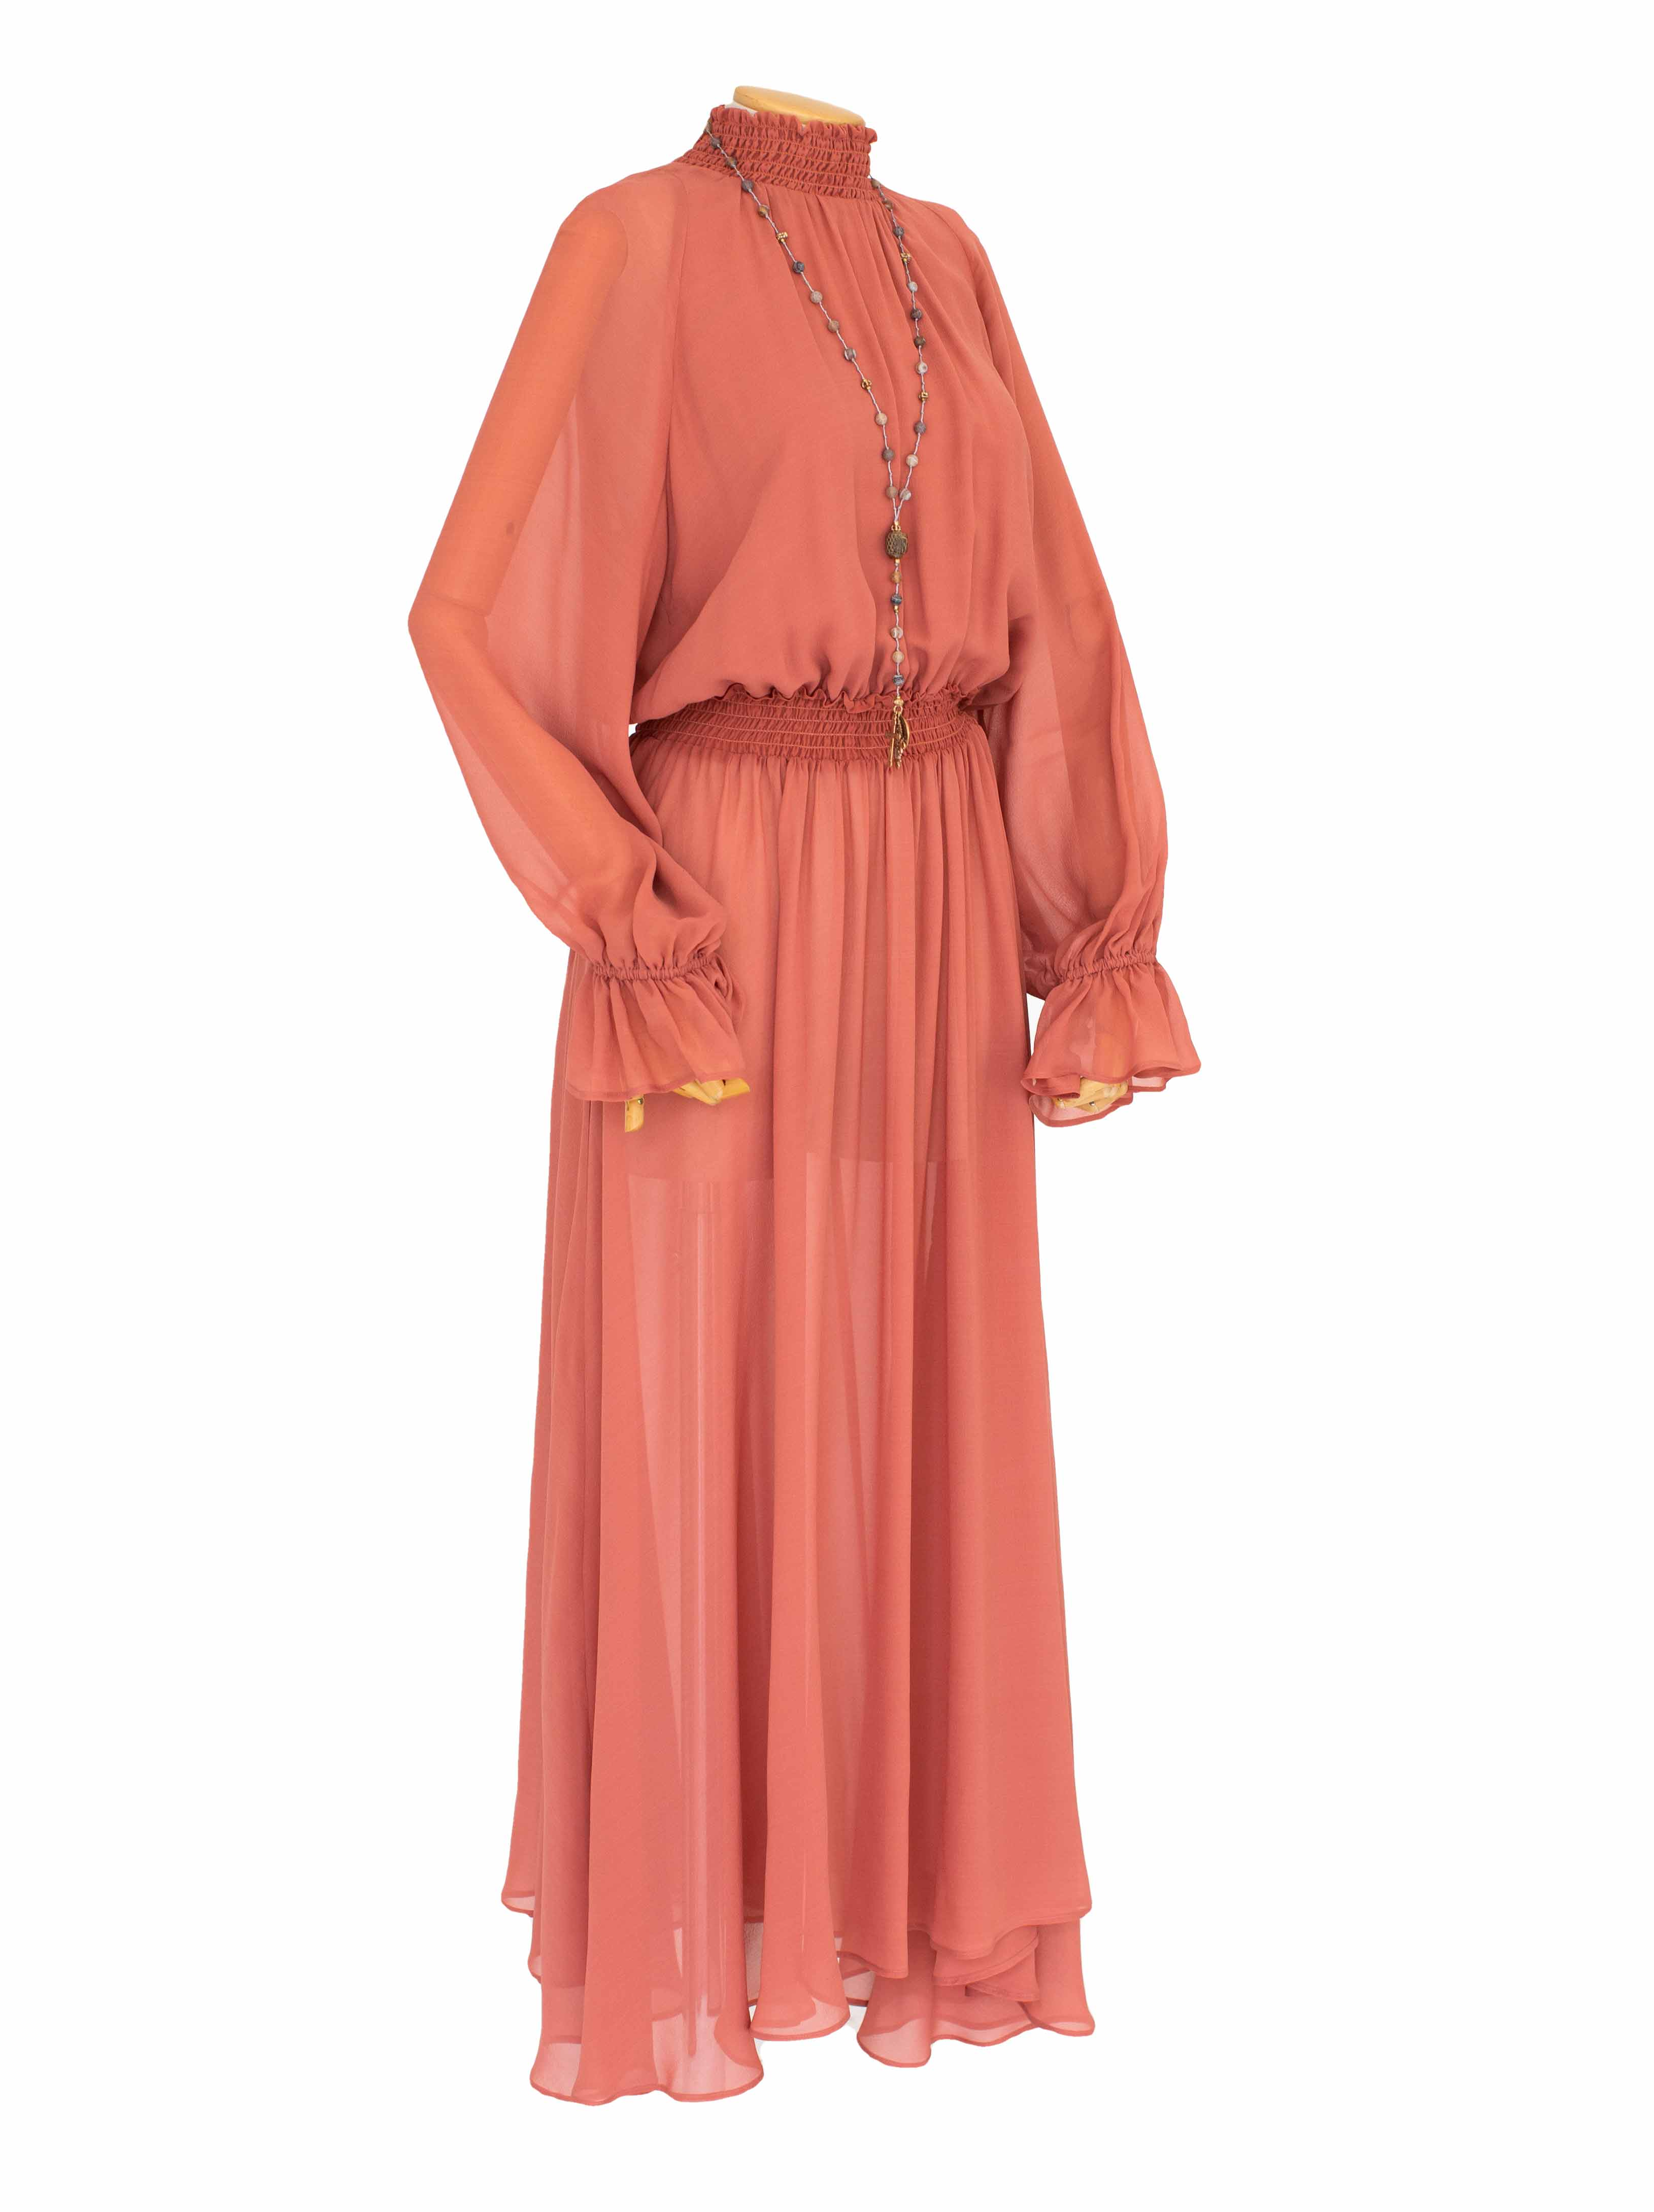 Crêpe georgette dress